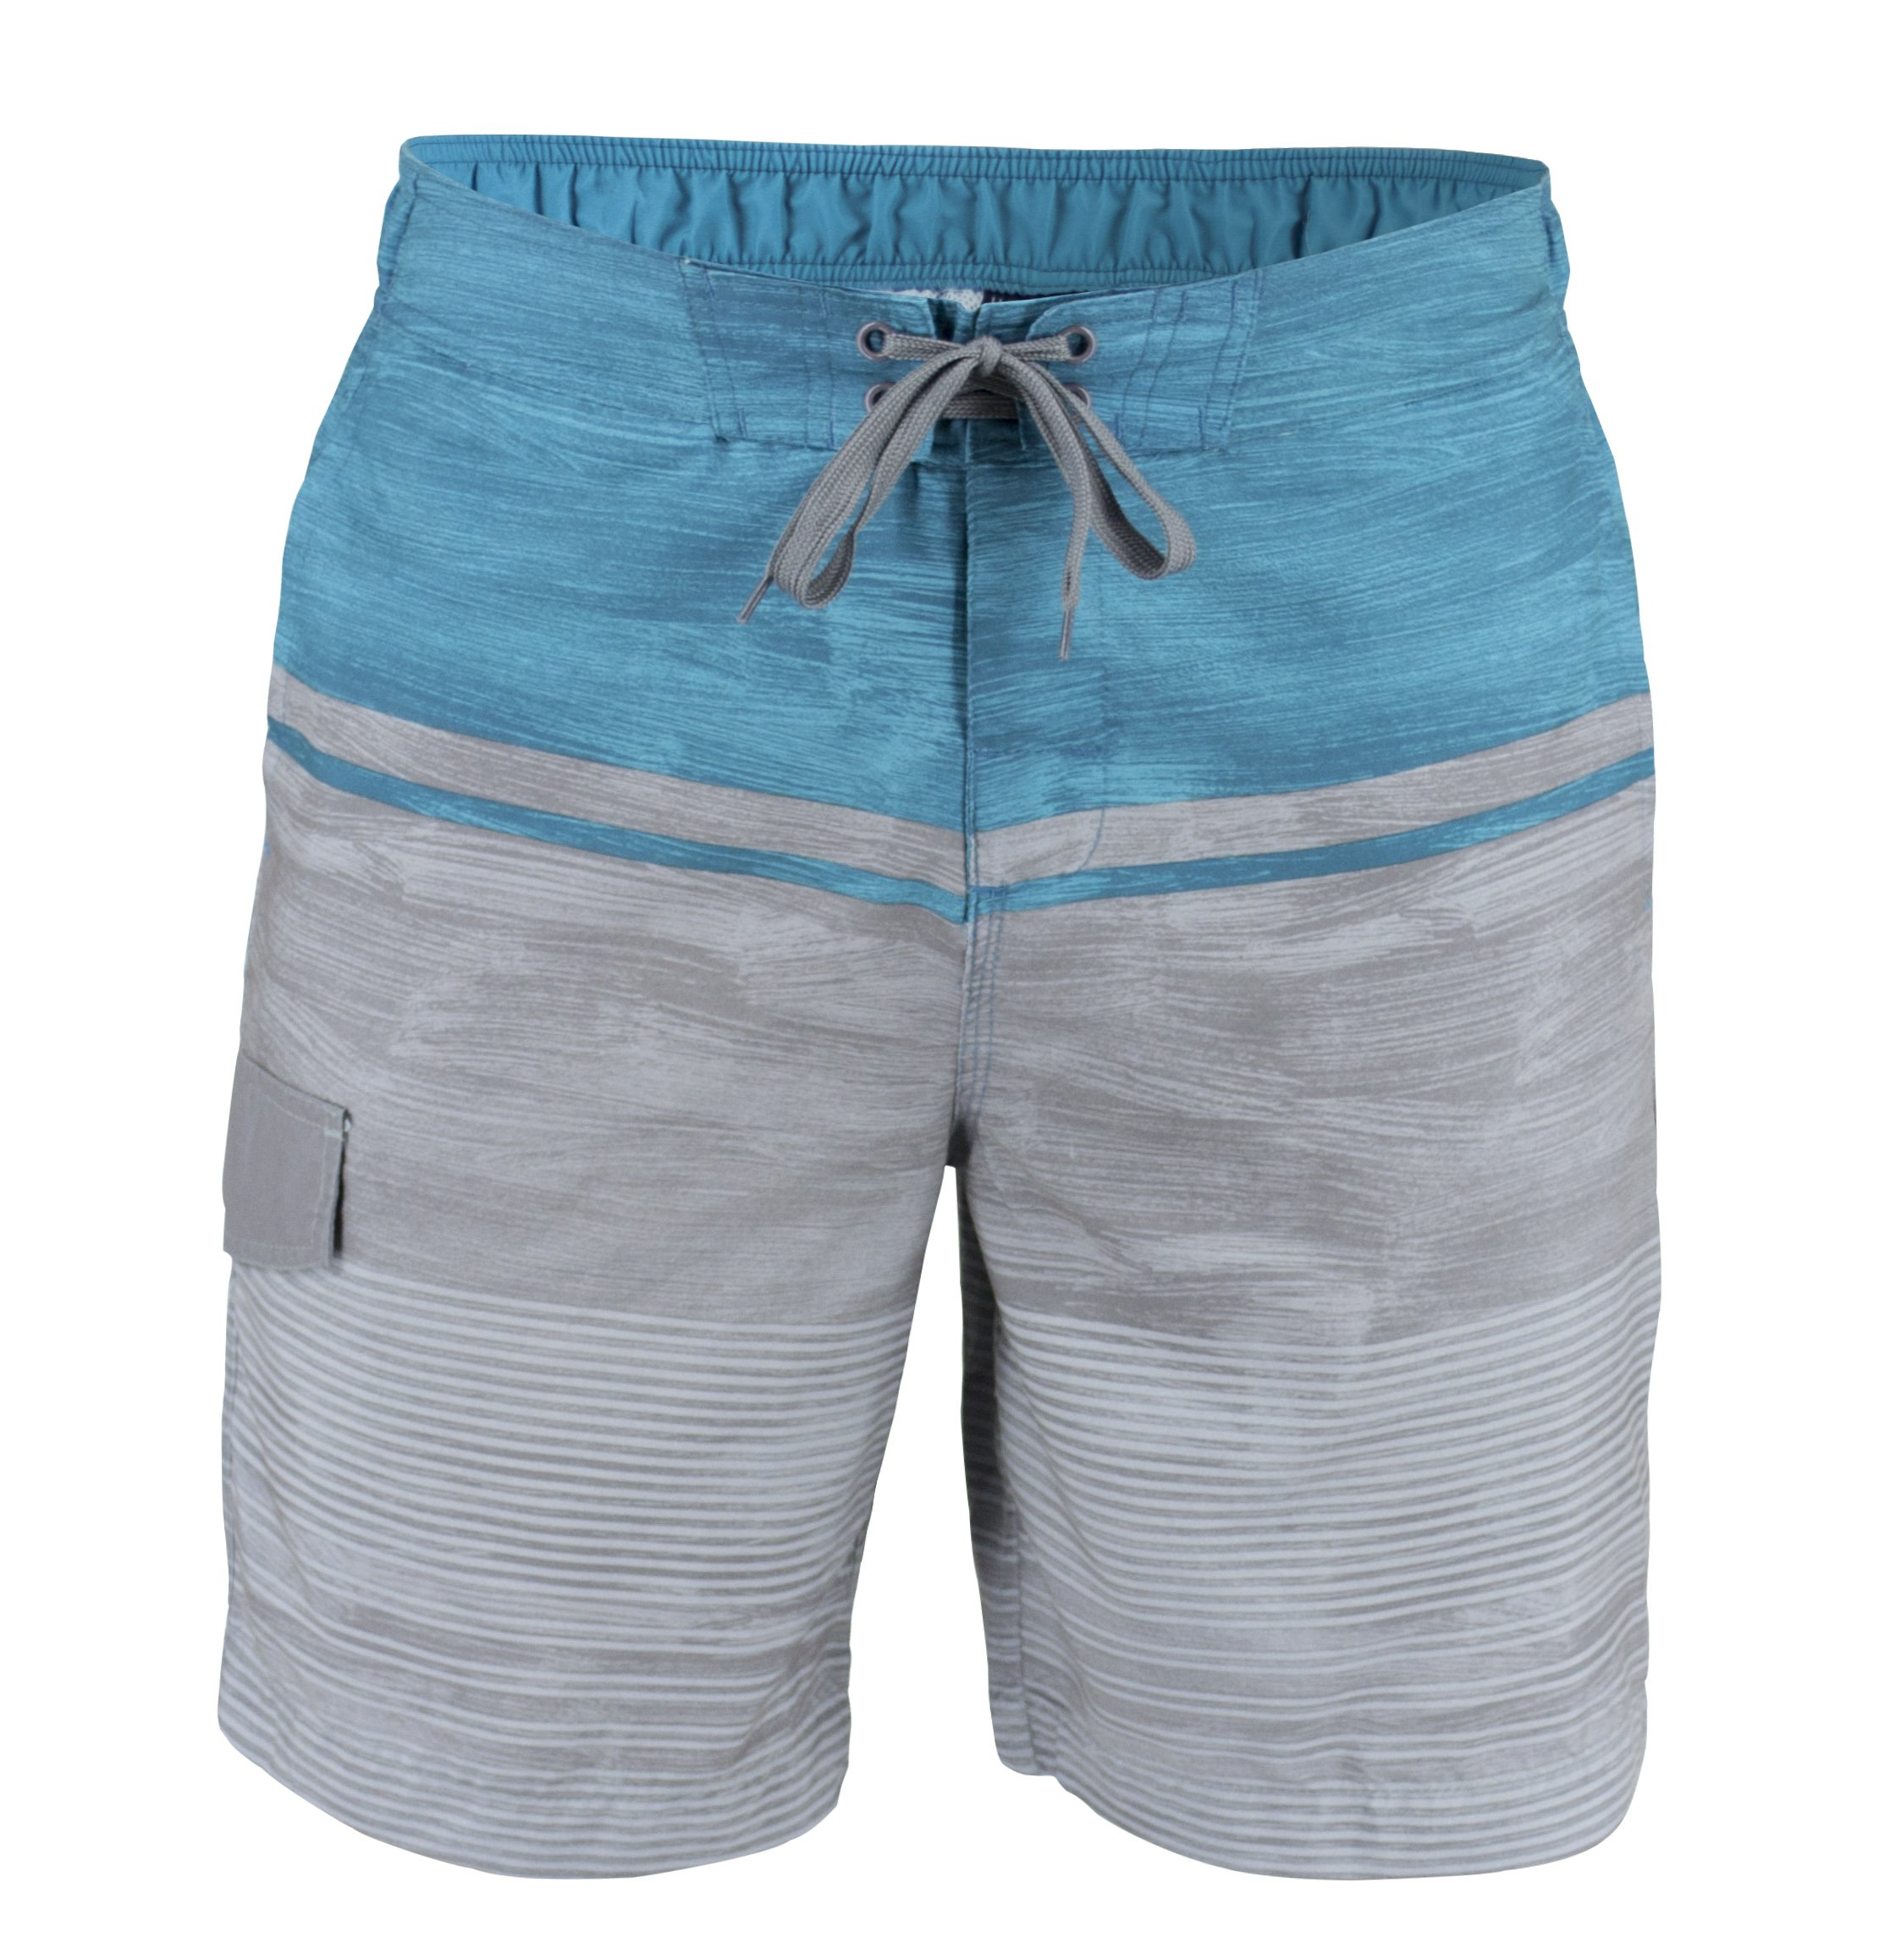 Matereek Men's Shorts Grey Heaven Swimwear Swim Trunks Green Grey M